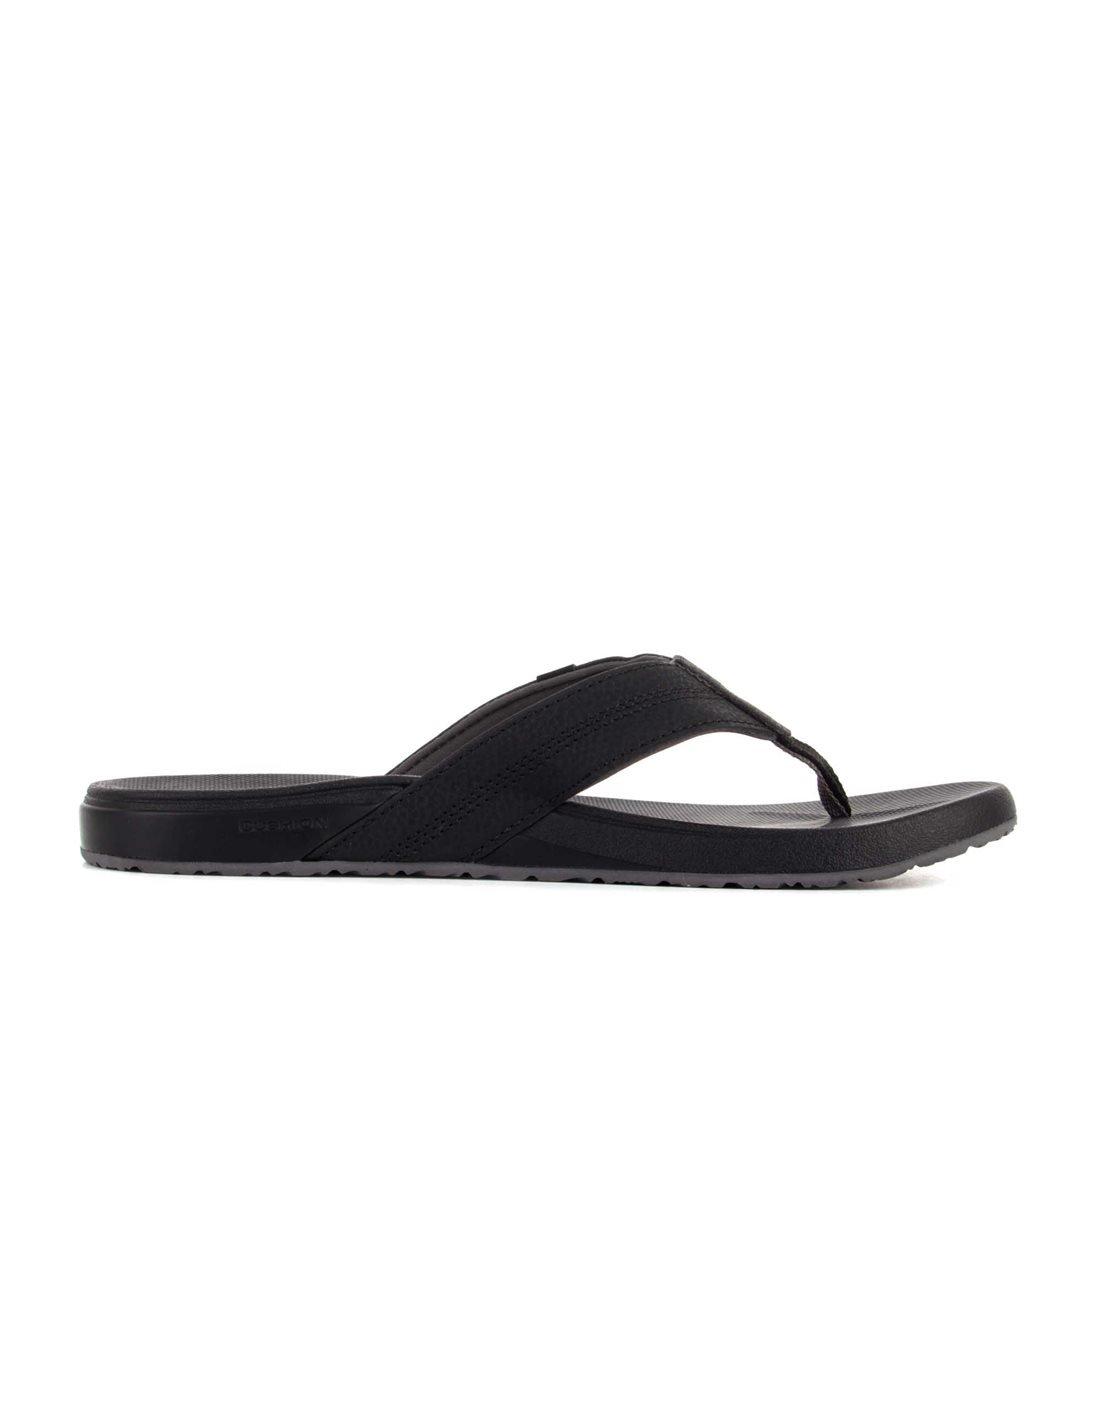 best loved 6e323 c854e adidas Originals - Superstar Men s Black Shoes